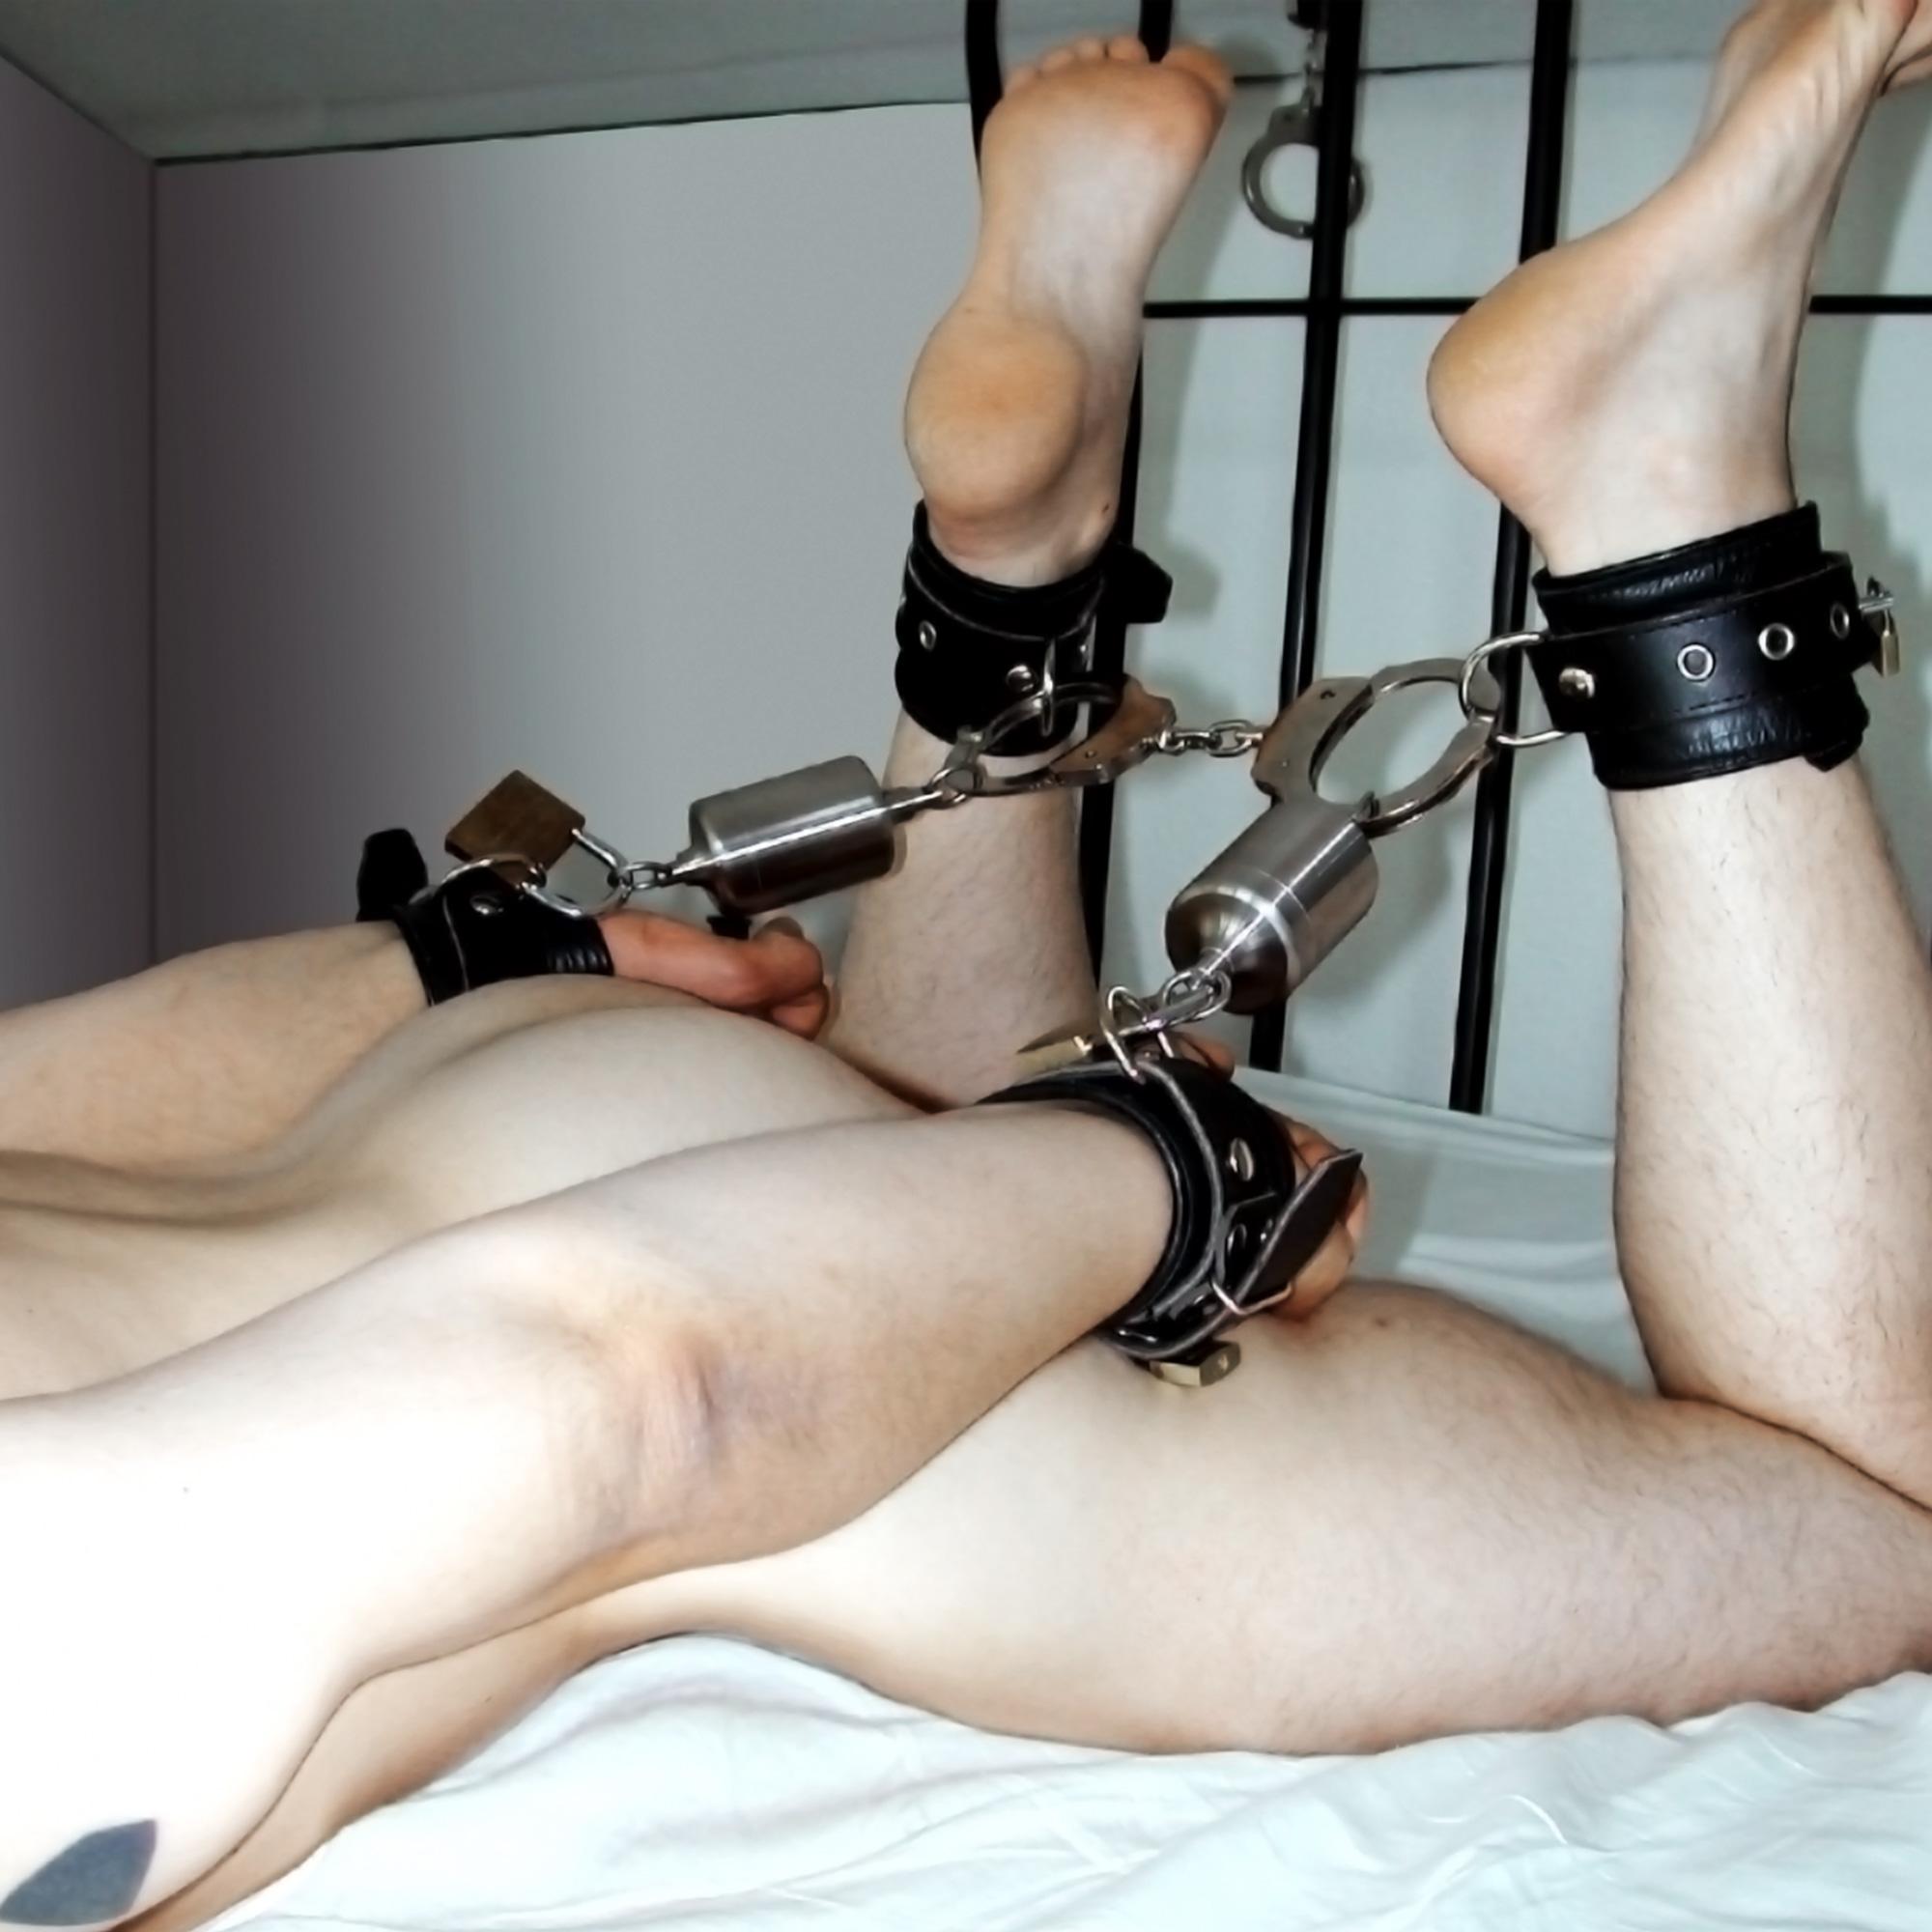 Self penis bondage